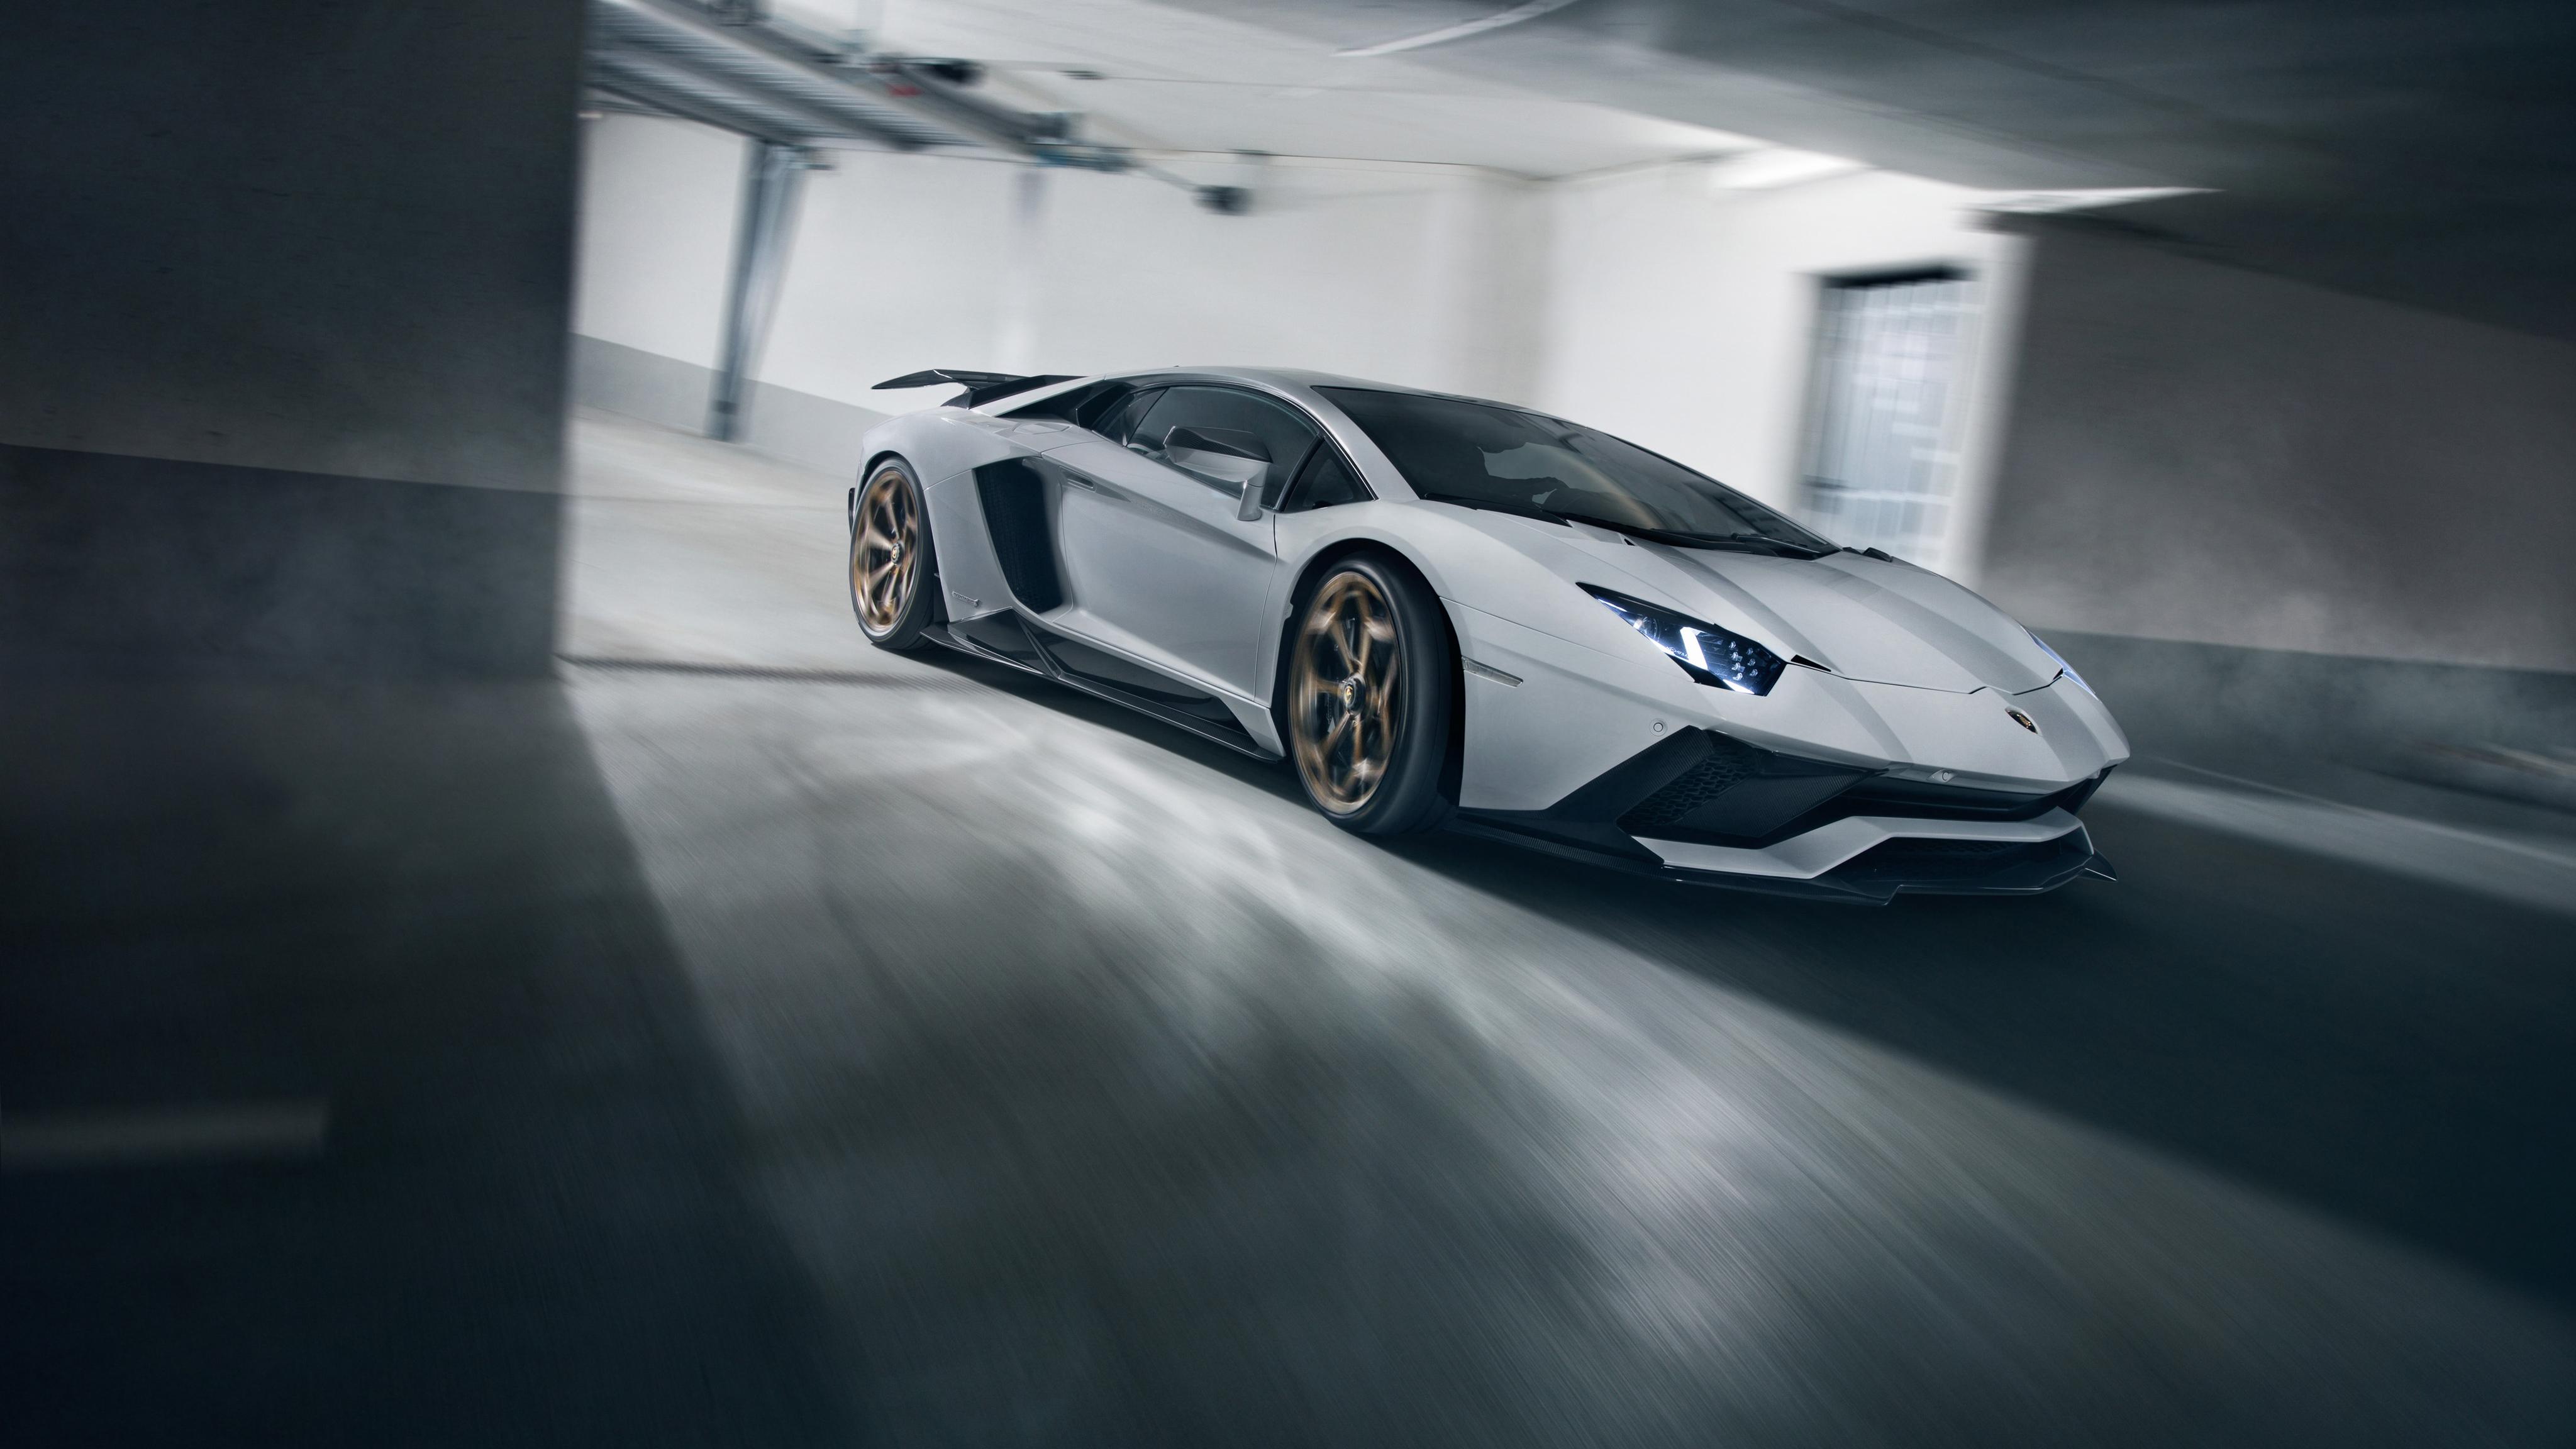 Lamborghini Aventador Car 4k Hd Desktop Wallpaper For 4k: 2018 Novitec Torado Lamborghini Aventador S 4K 4 Wallpaper